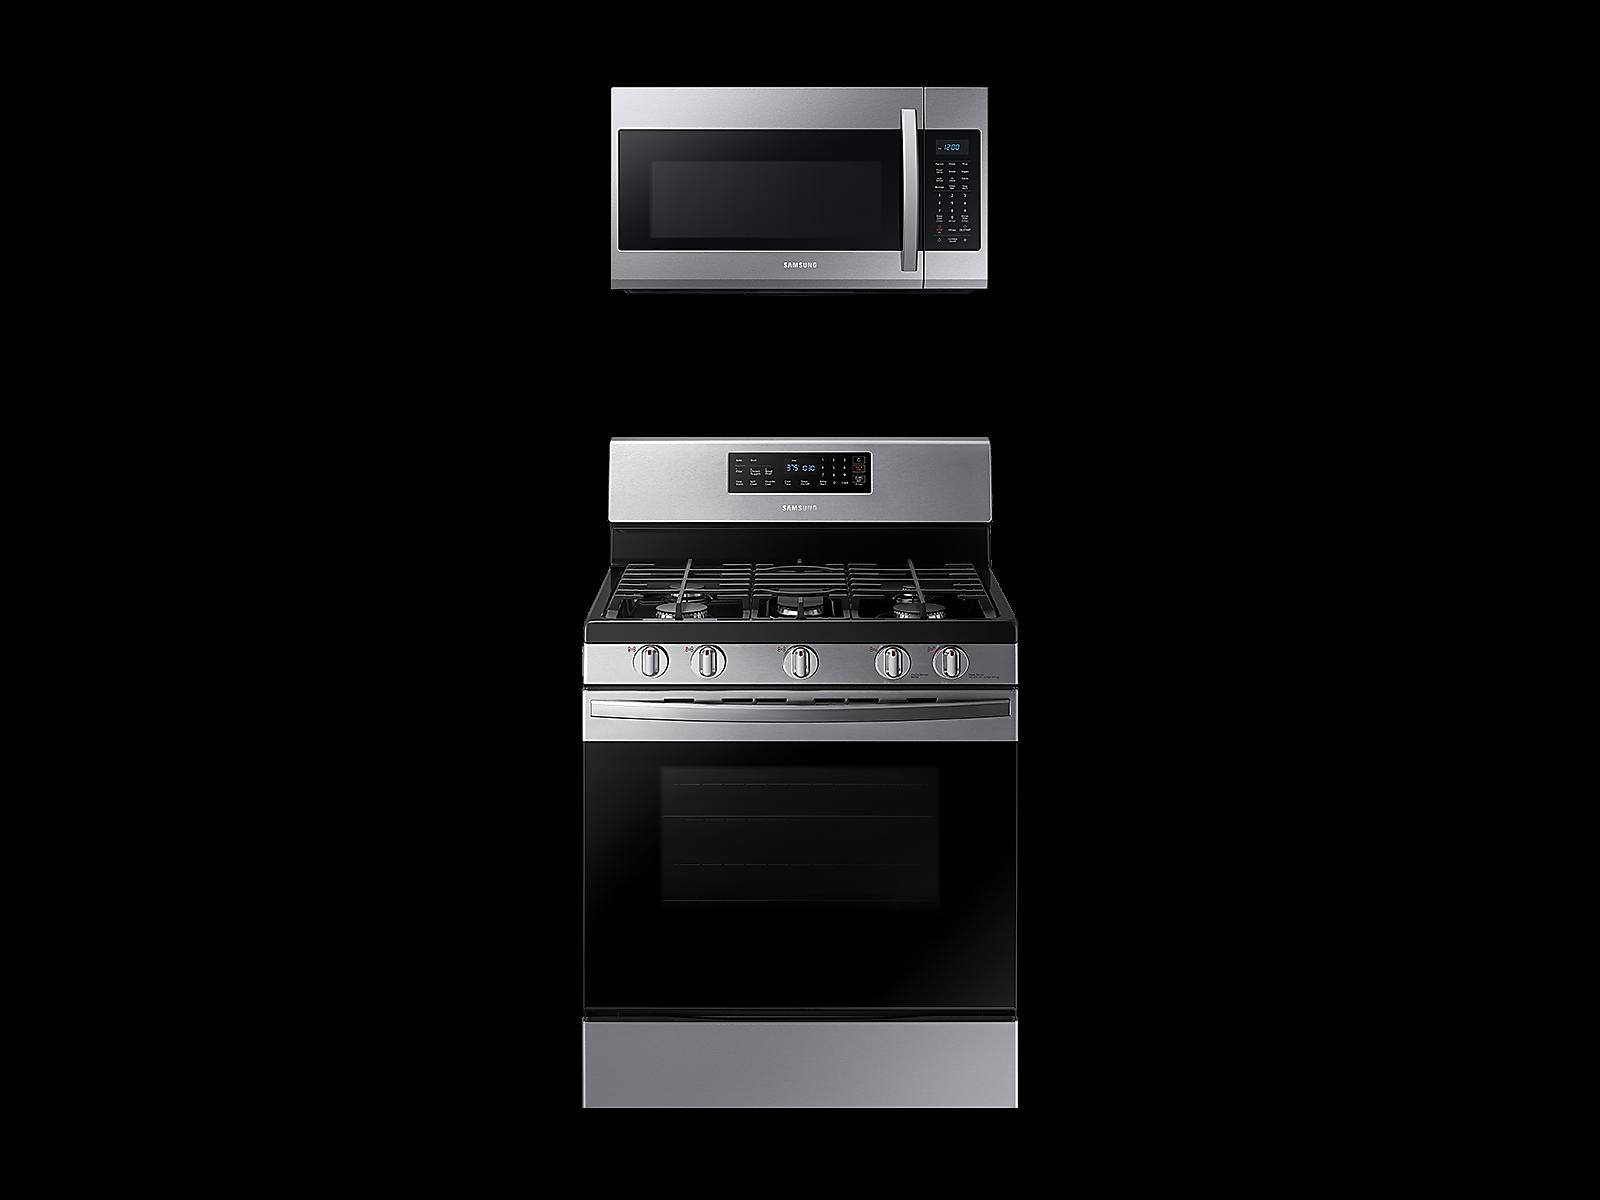 Samsung Freestanding Gas Range + Over-the-Range Microwave in Stainless Steel(BNDL-1580226046010)